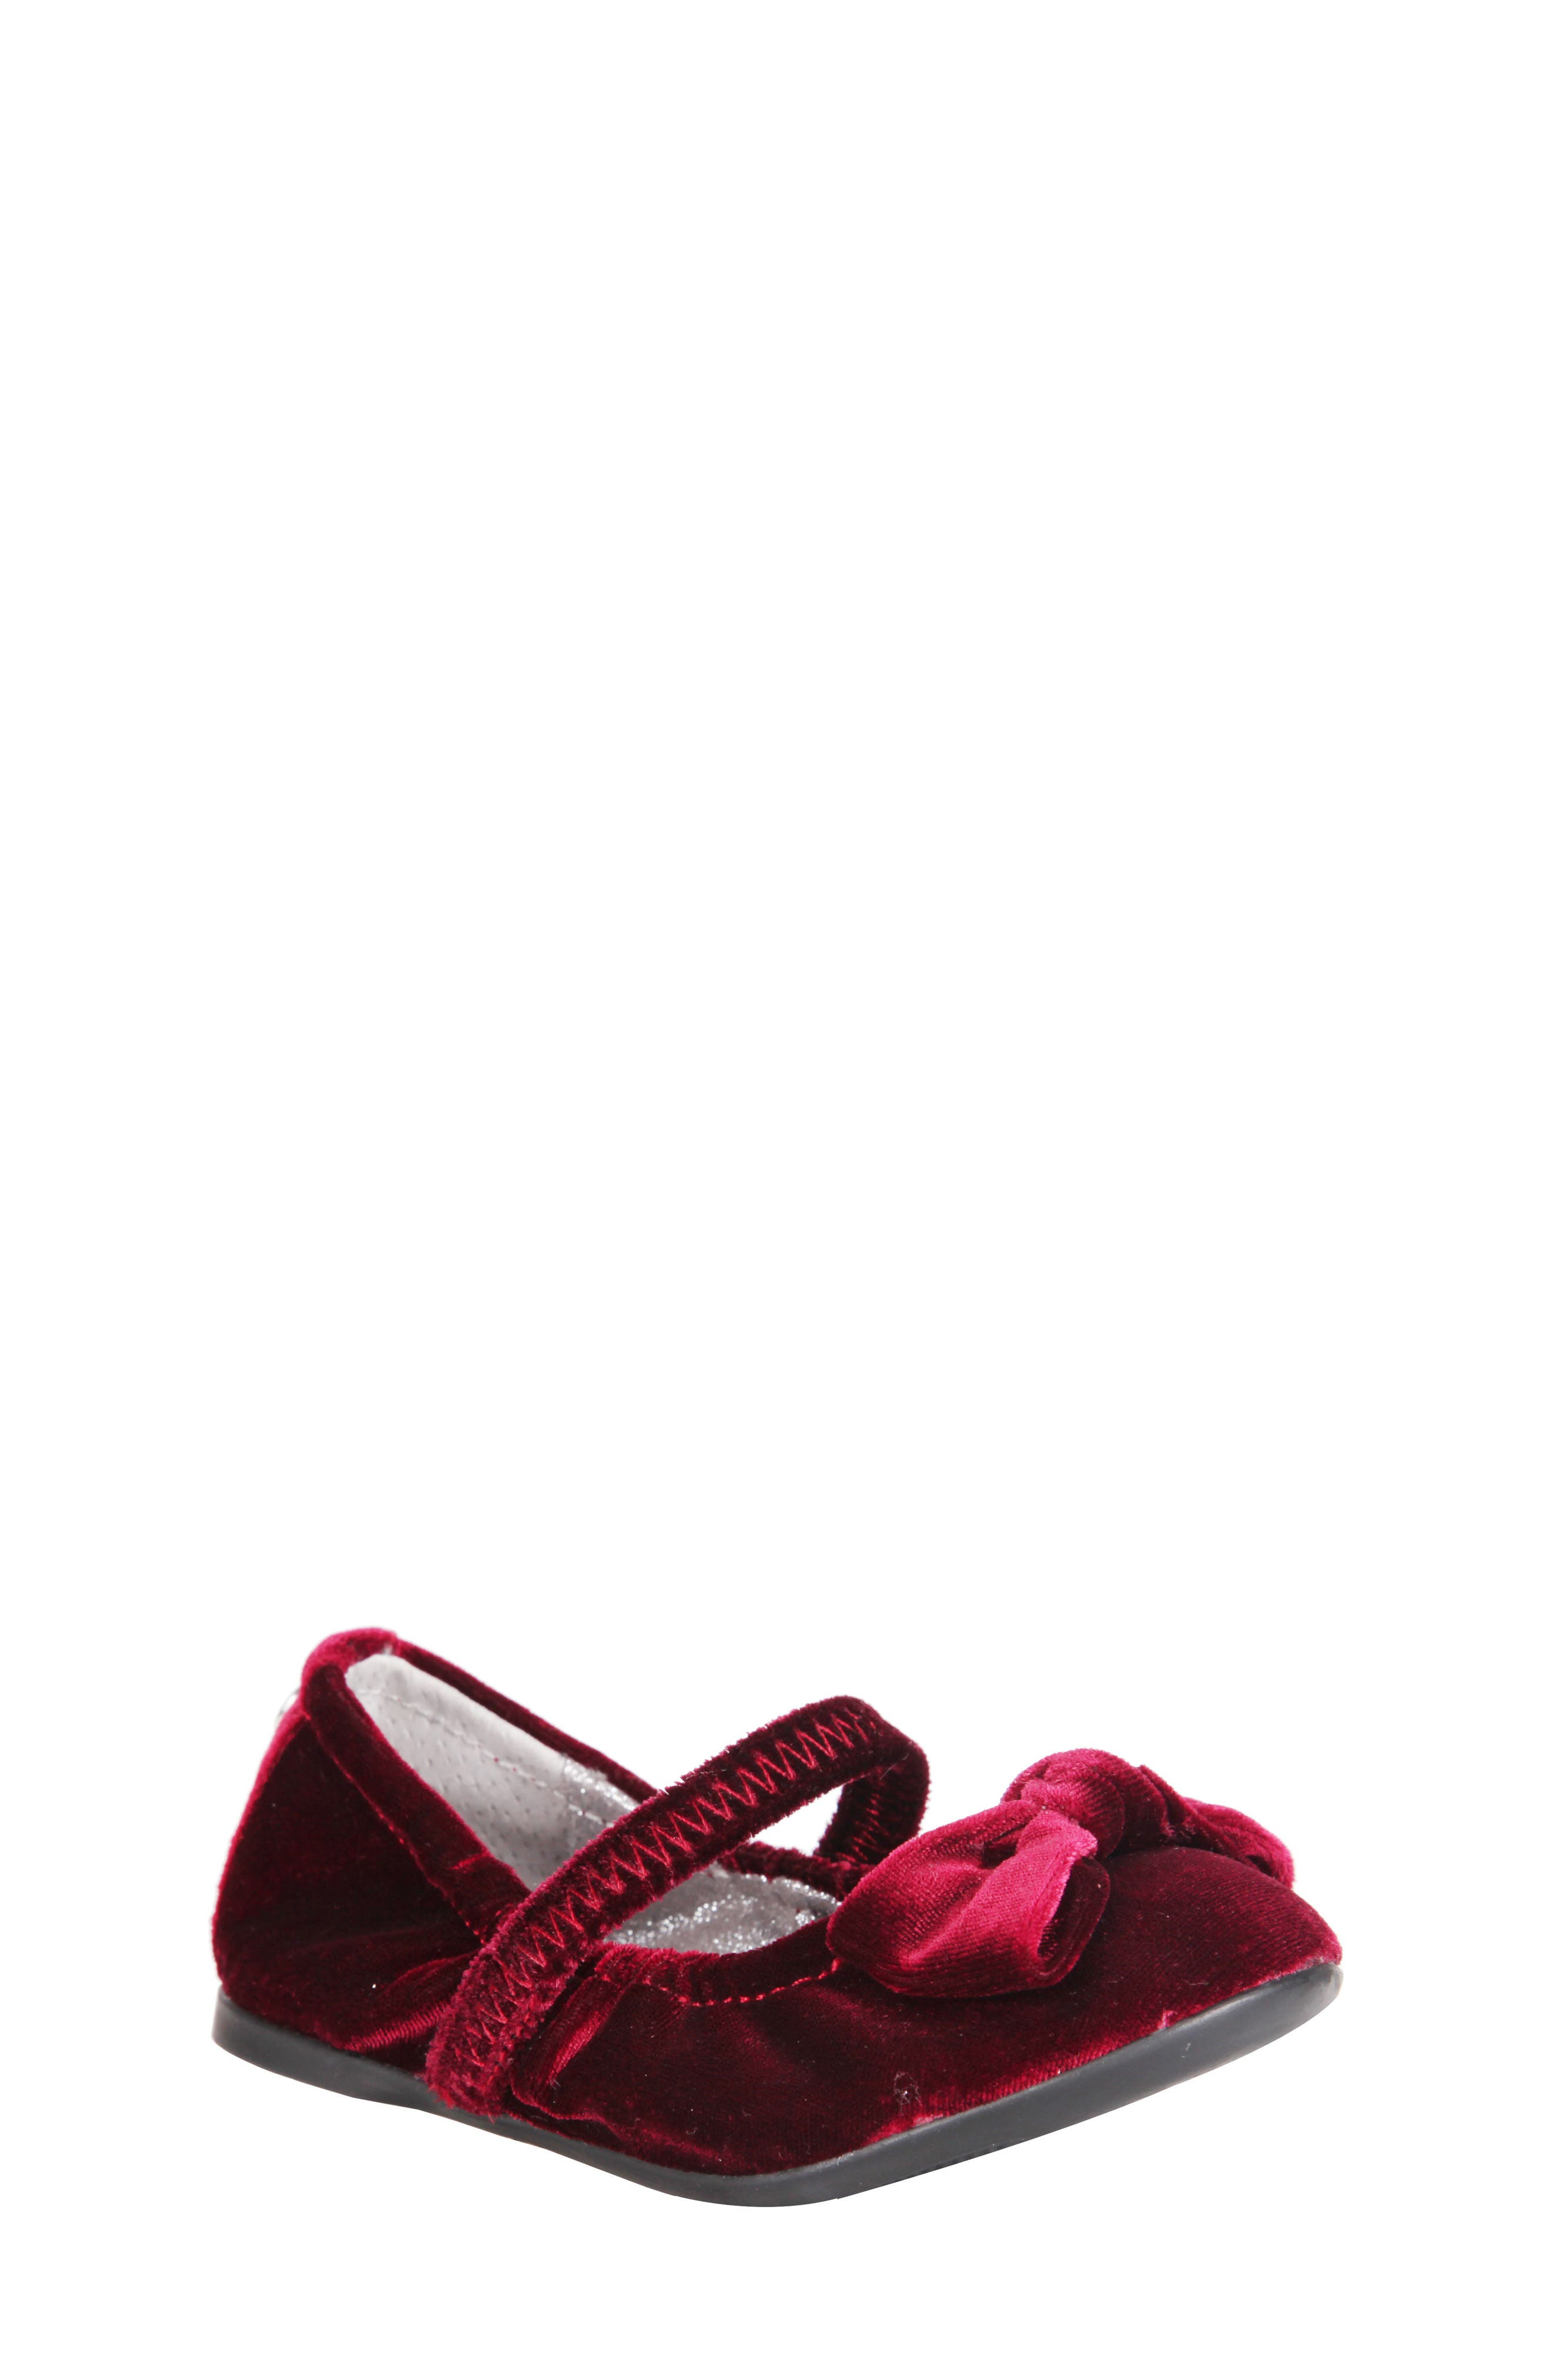 Nina Karla Mary Jane Ballet Flat (Walker & Toddler)